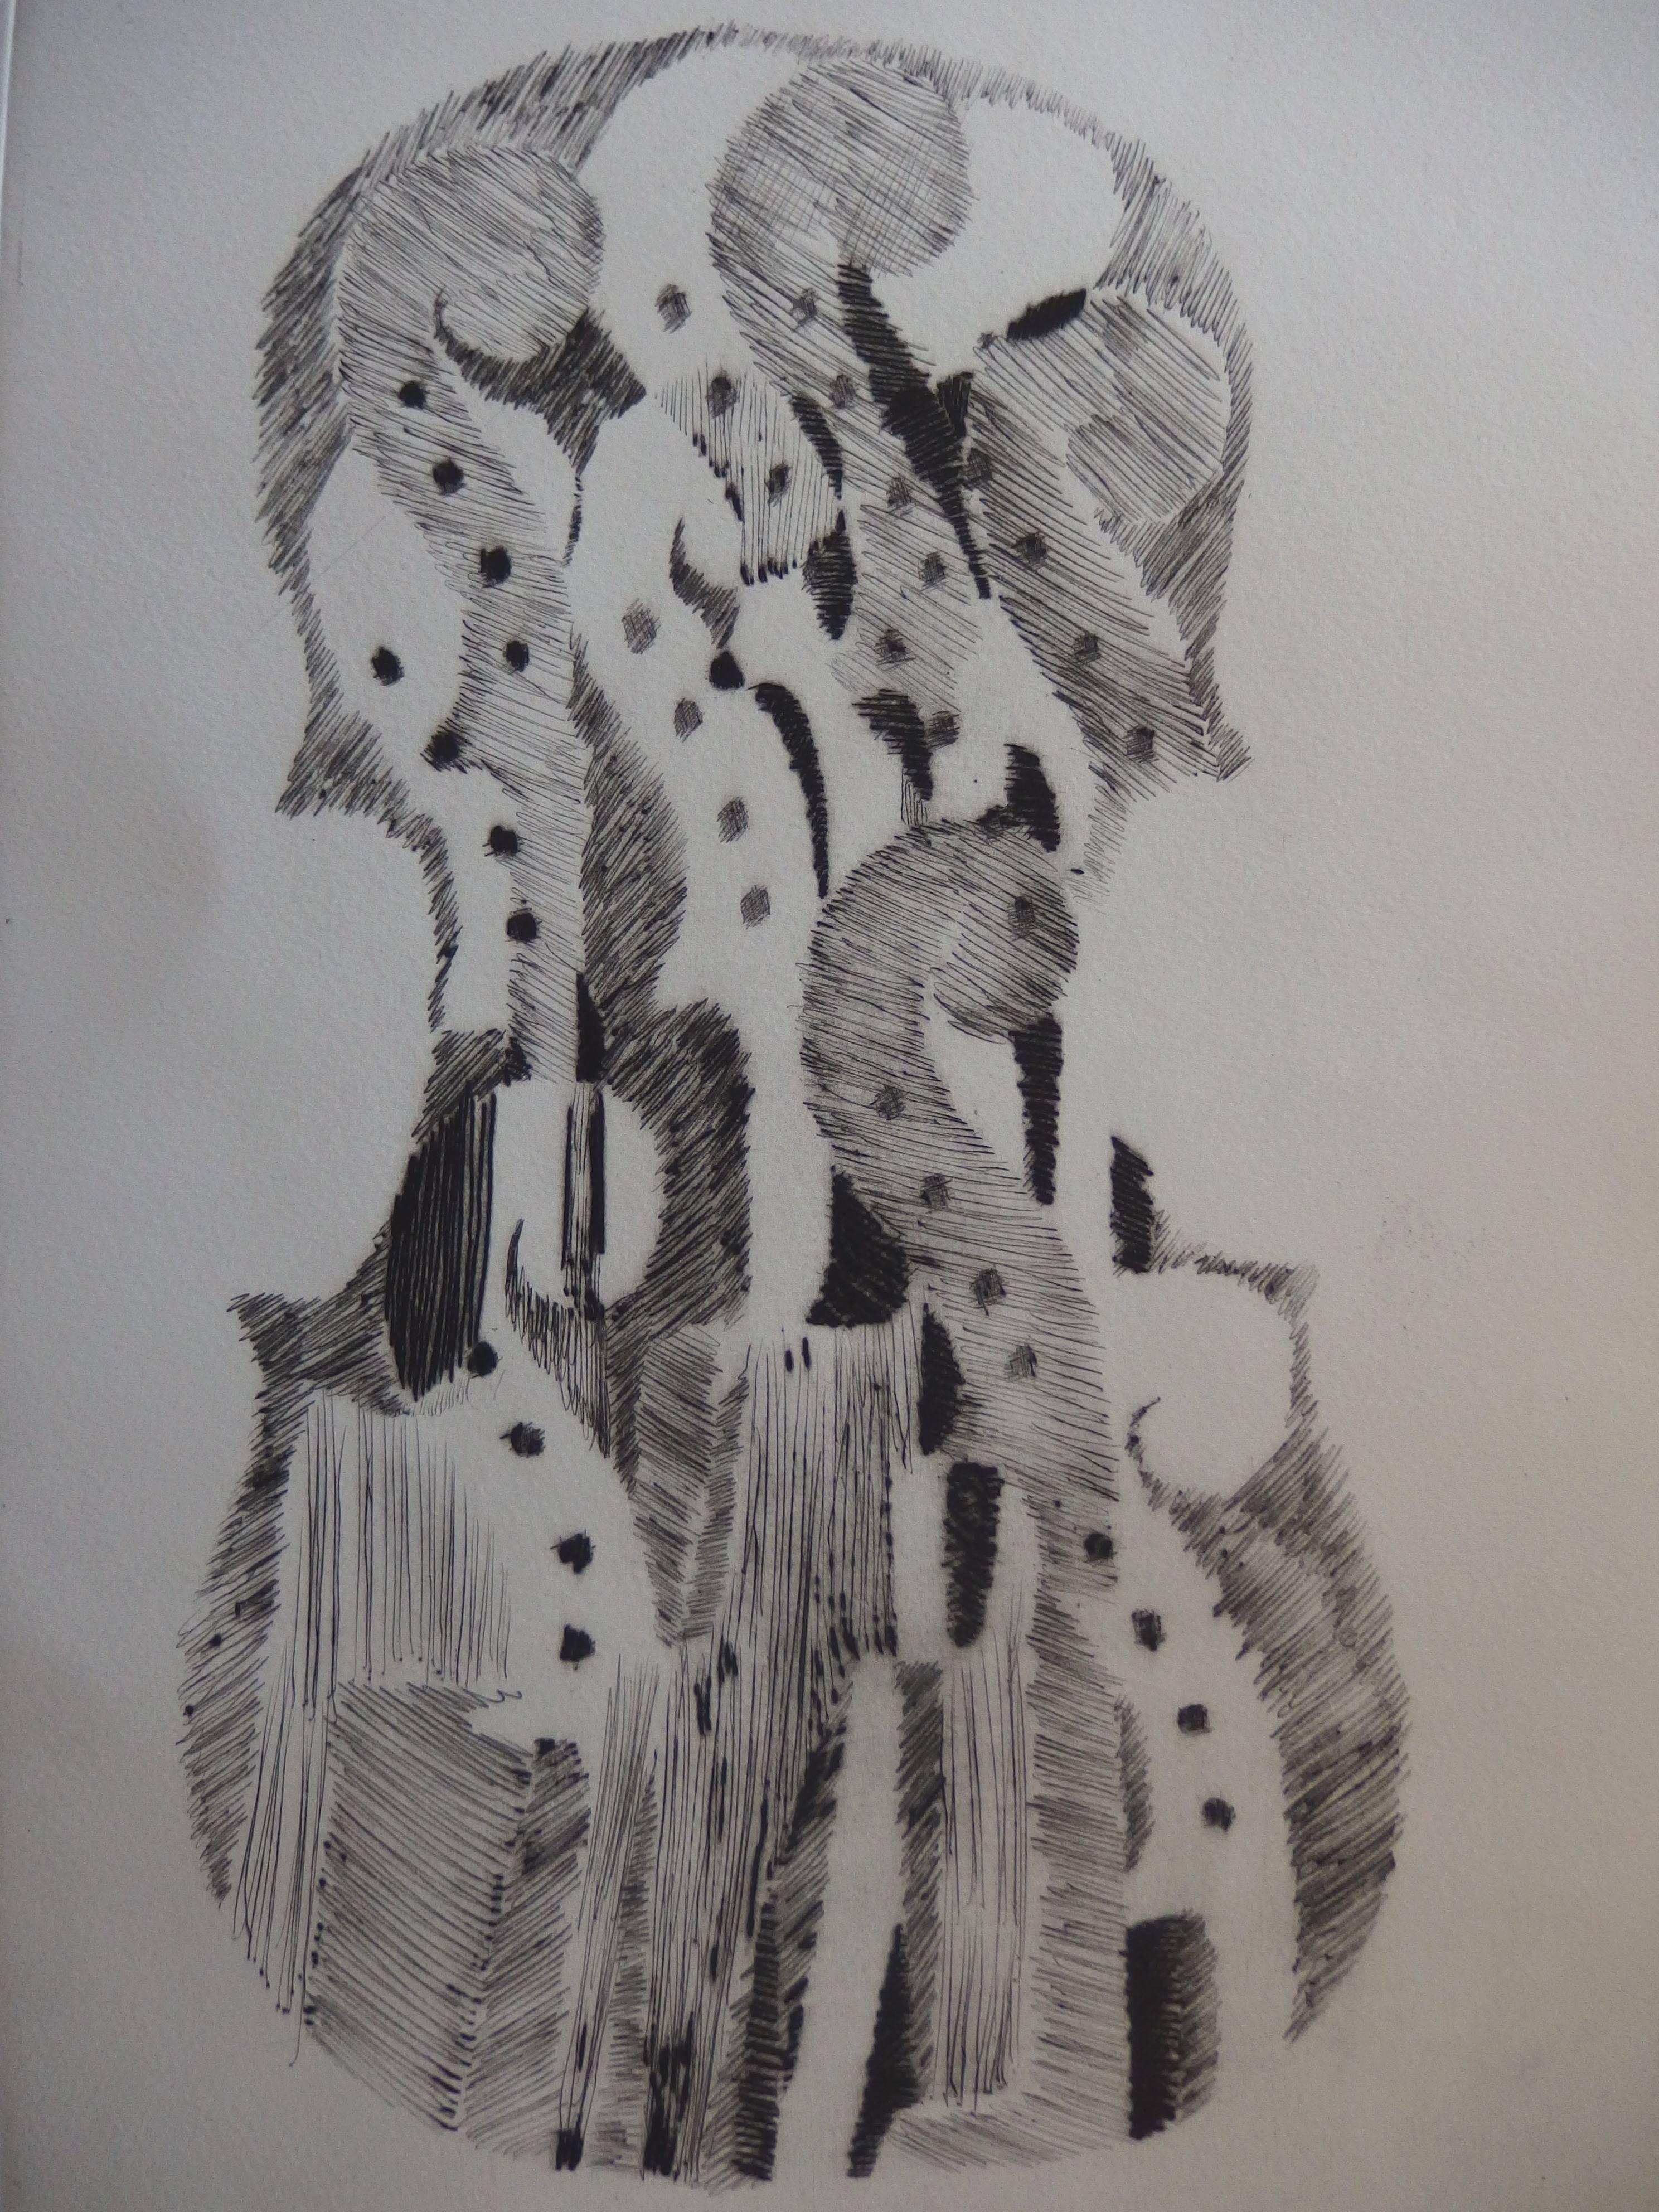 Accumulation of Scrolls - Original etching - 1979